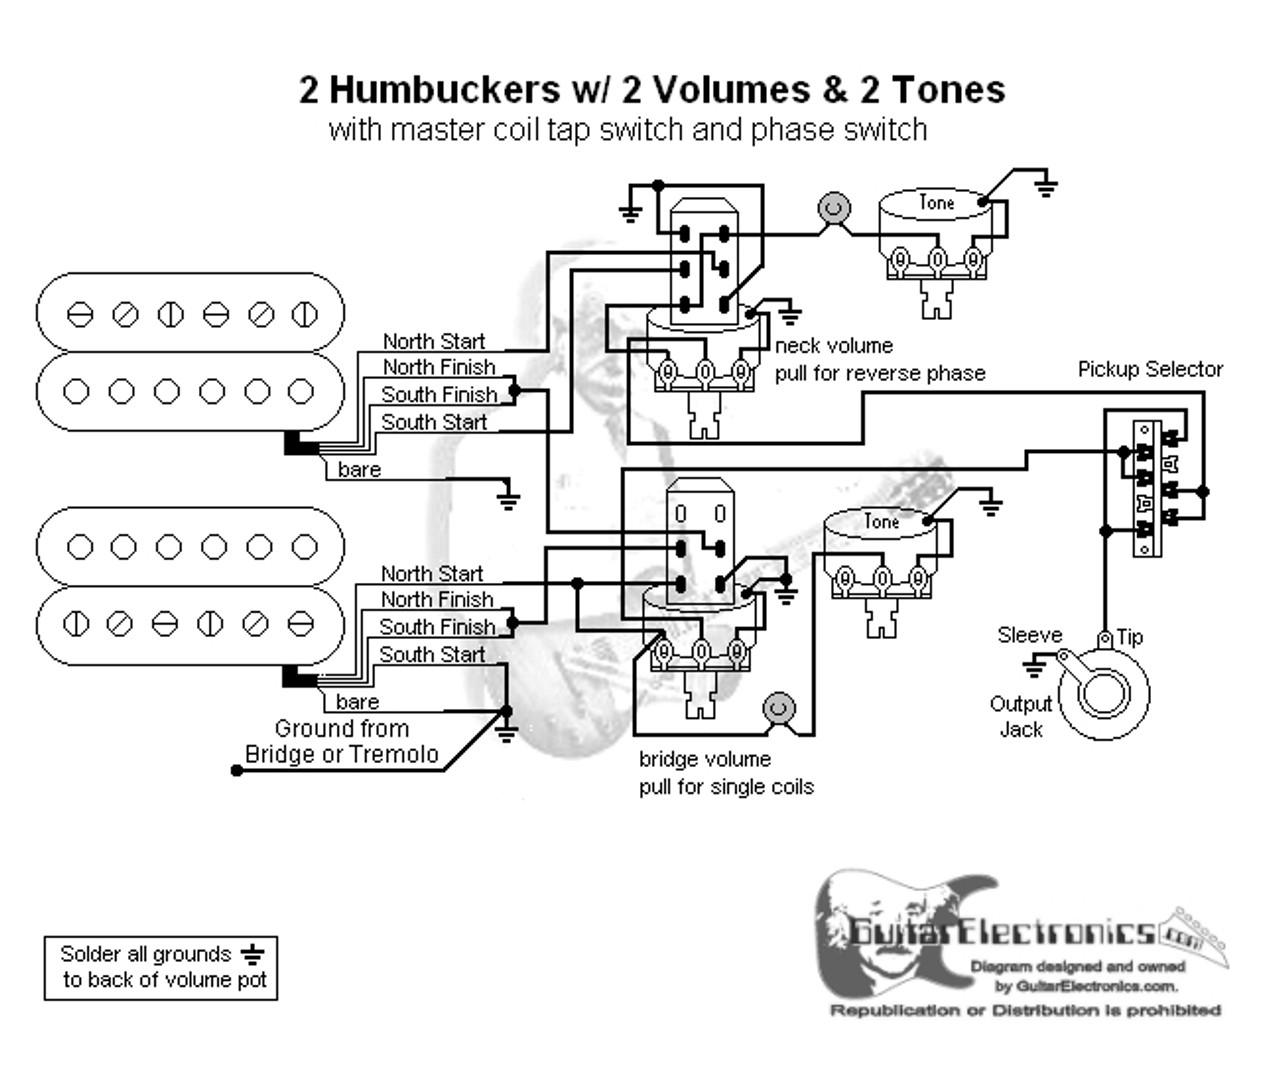 medium resolution of 2 hbs 3 way lever 2 vol 2 tones coil tap u0026 reverse phasesound bridge